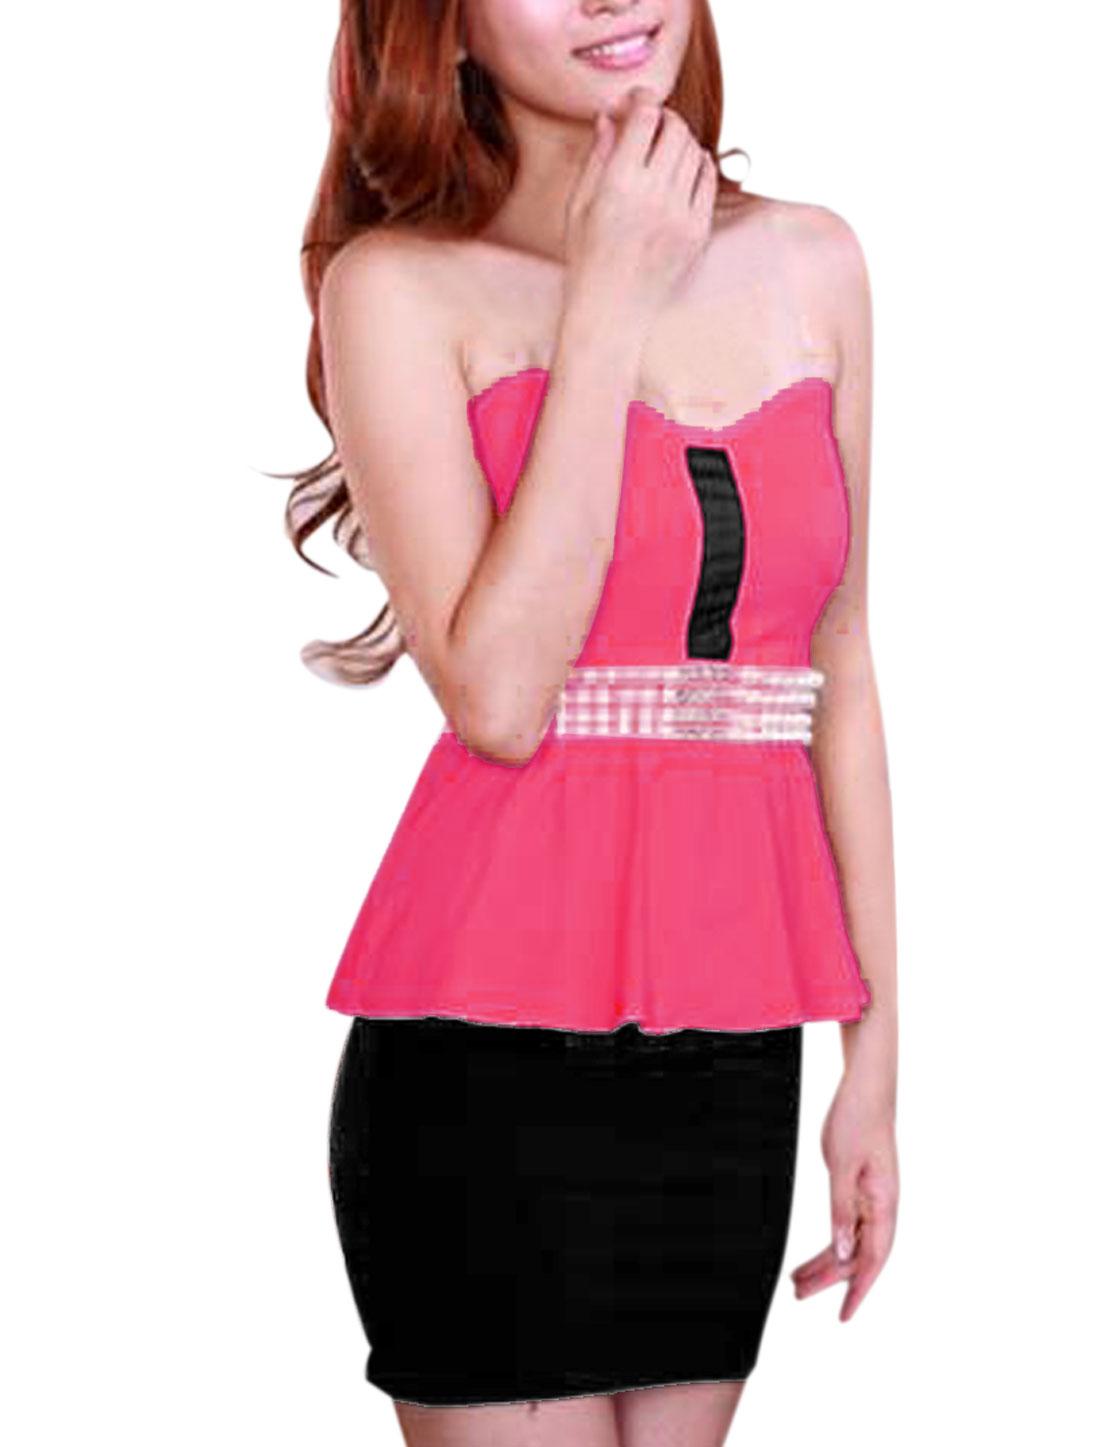 Women Sleeveless Transparent Straps Peplum Dress Fuchsia Black XS